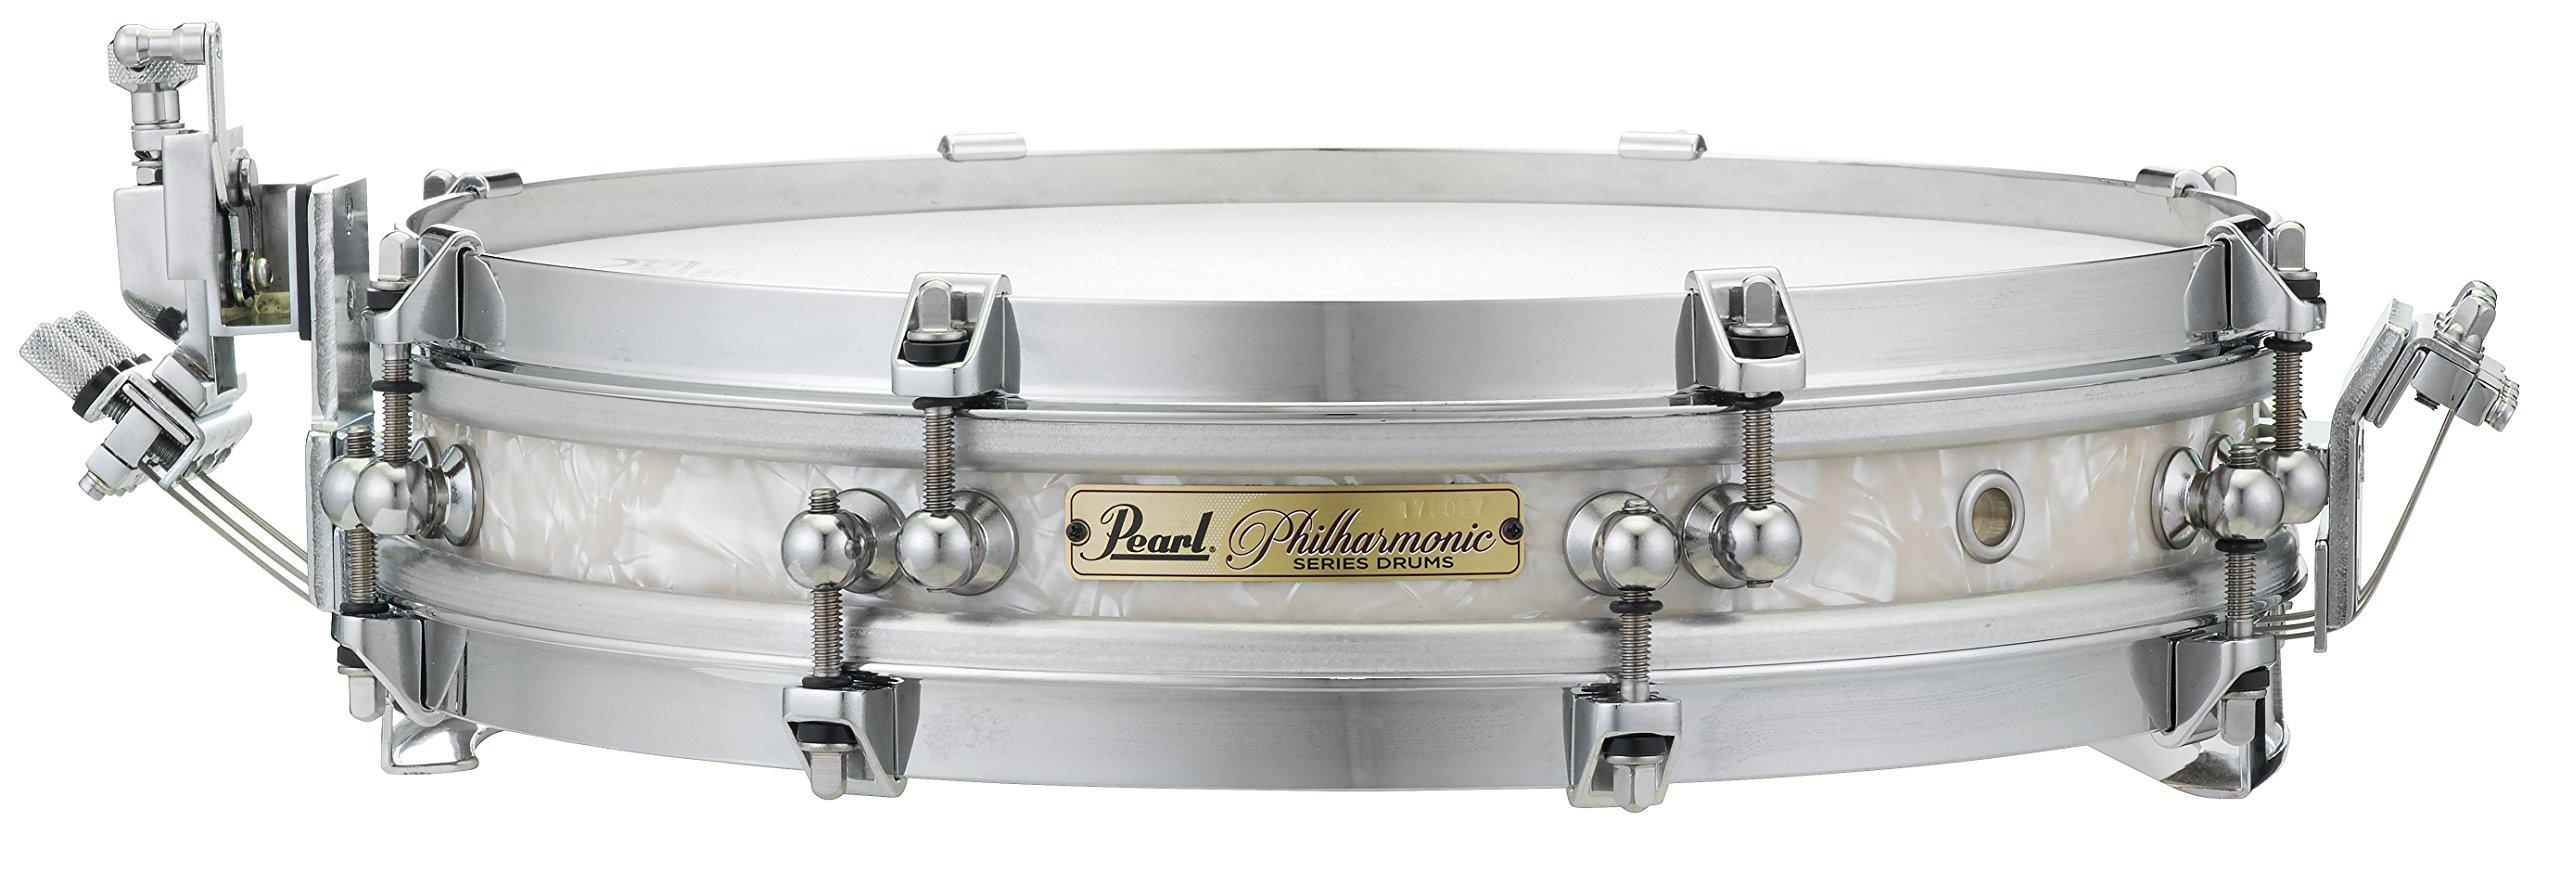 Pearl Philharmonic PHP-1325/C405 13 x 2.5 ''Pancake'' Snare Drum